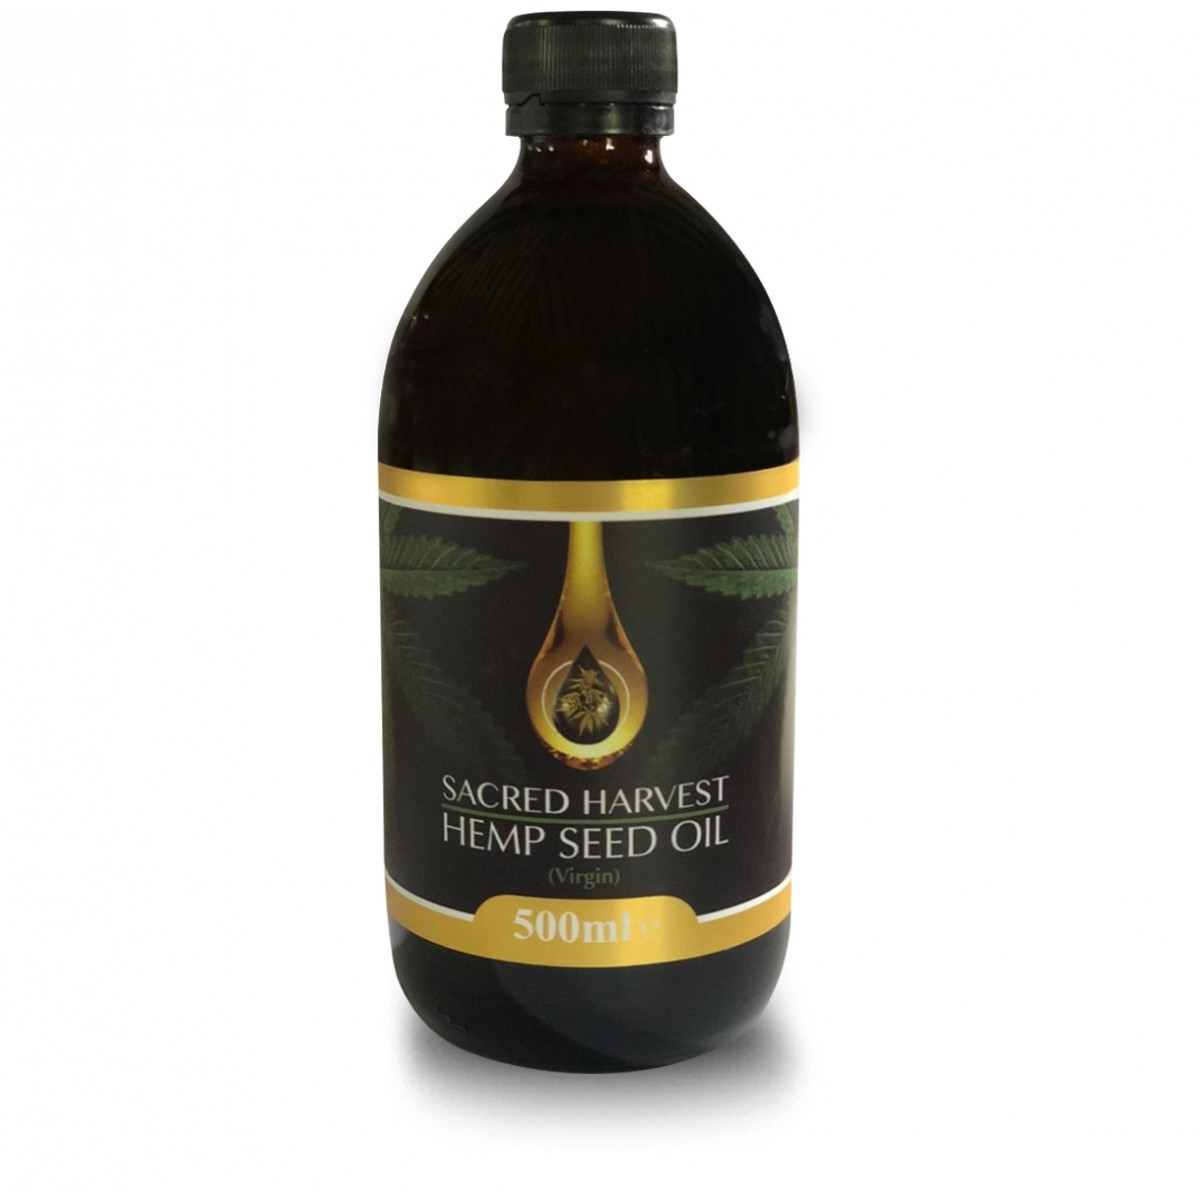 Hemp Seed Oil (Virgin) - 500ml - Nutritional Oils | Ancient Purity